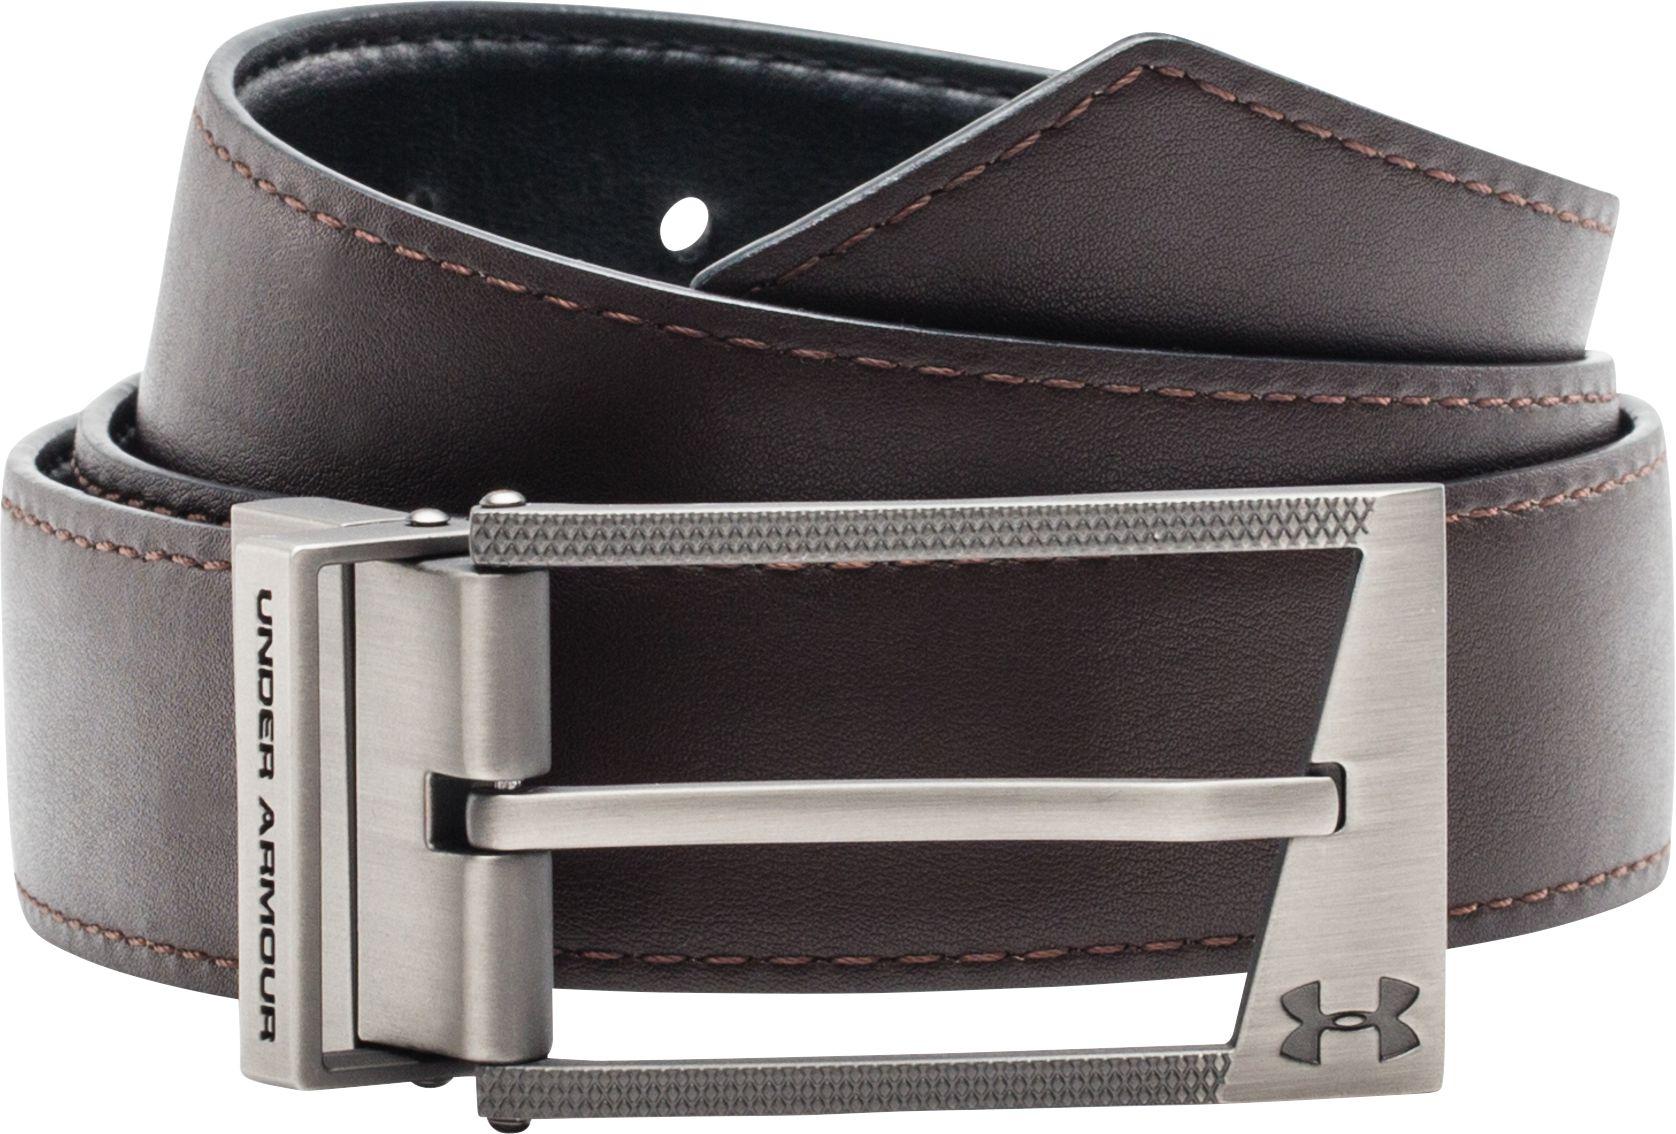 Under Armour Mens Reversible Leather Golf Belt DICKS Sporting Goods